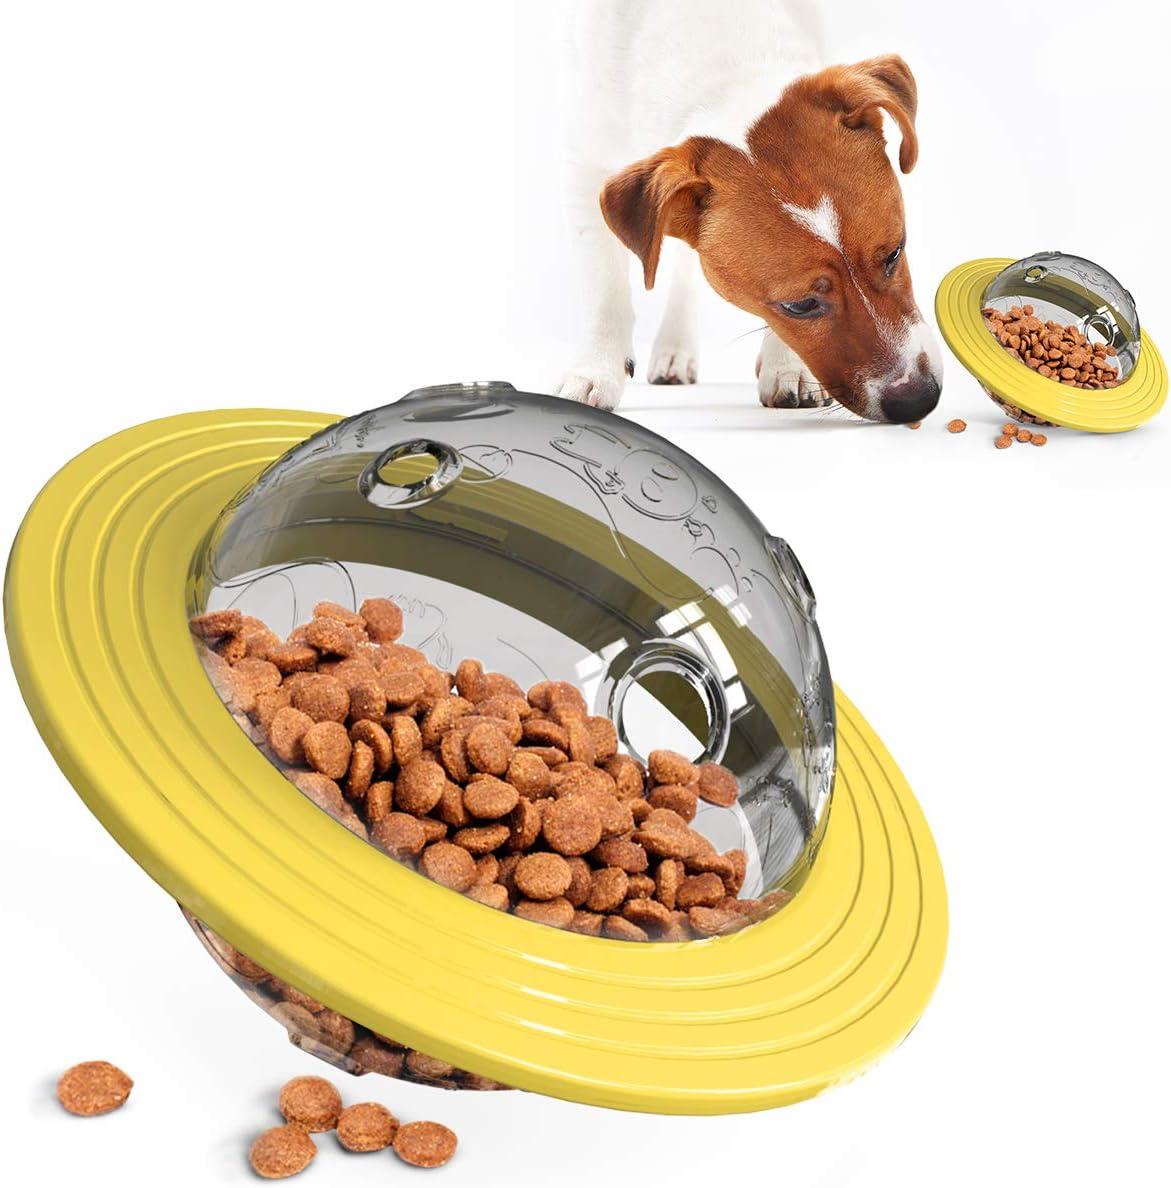 DOITPE Dog Treat Ball UFO Food Dispenser Puzzle Slow Feeder Ball, Interactive Dog Frisbee Toy (Yellow)